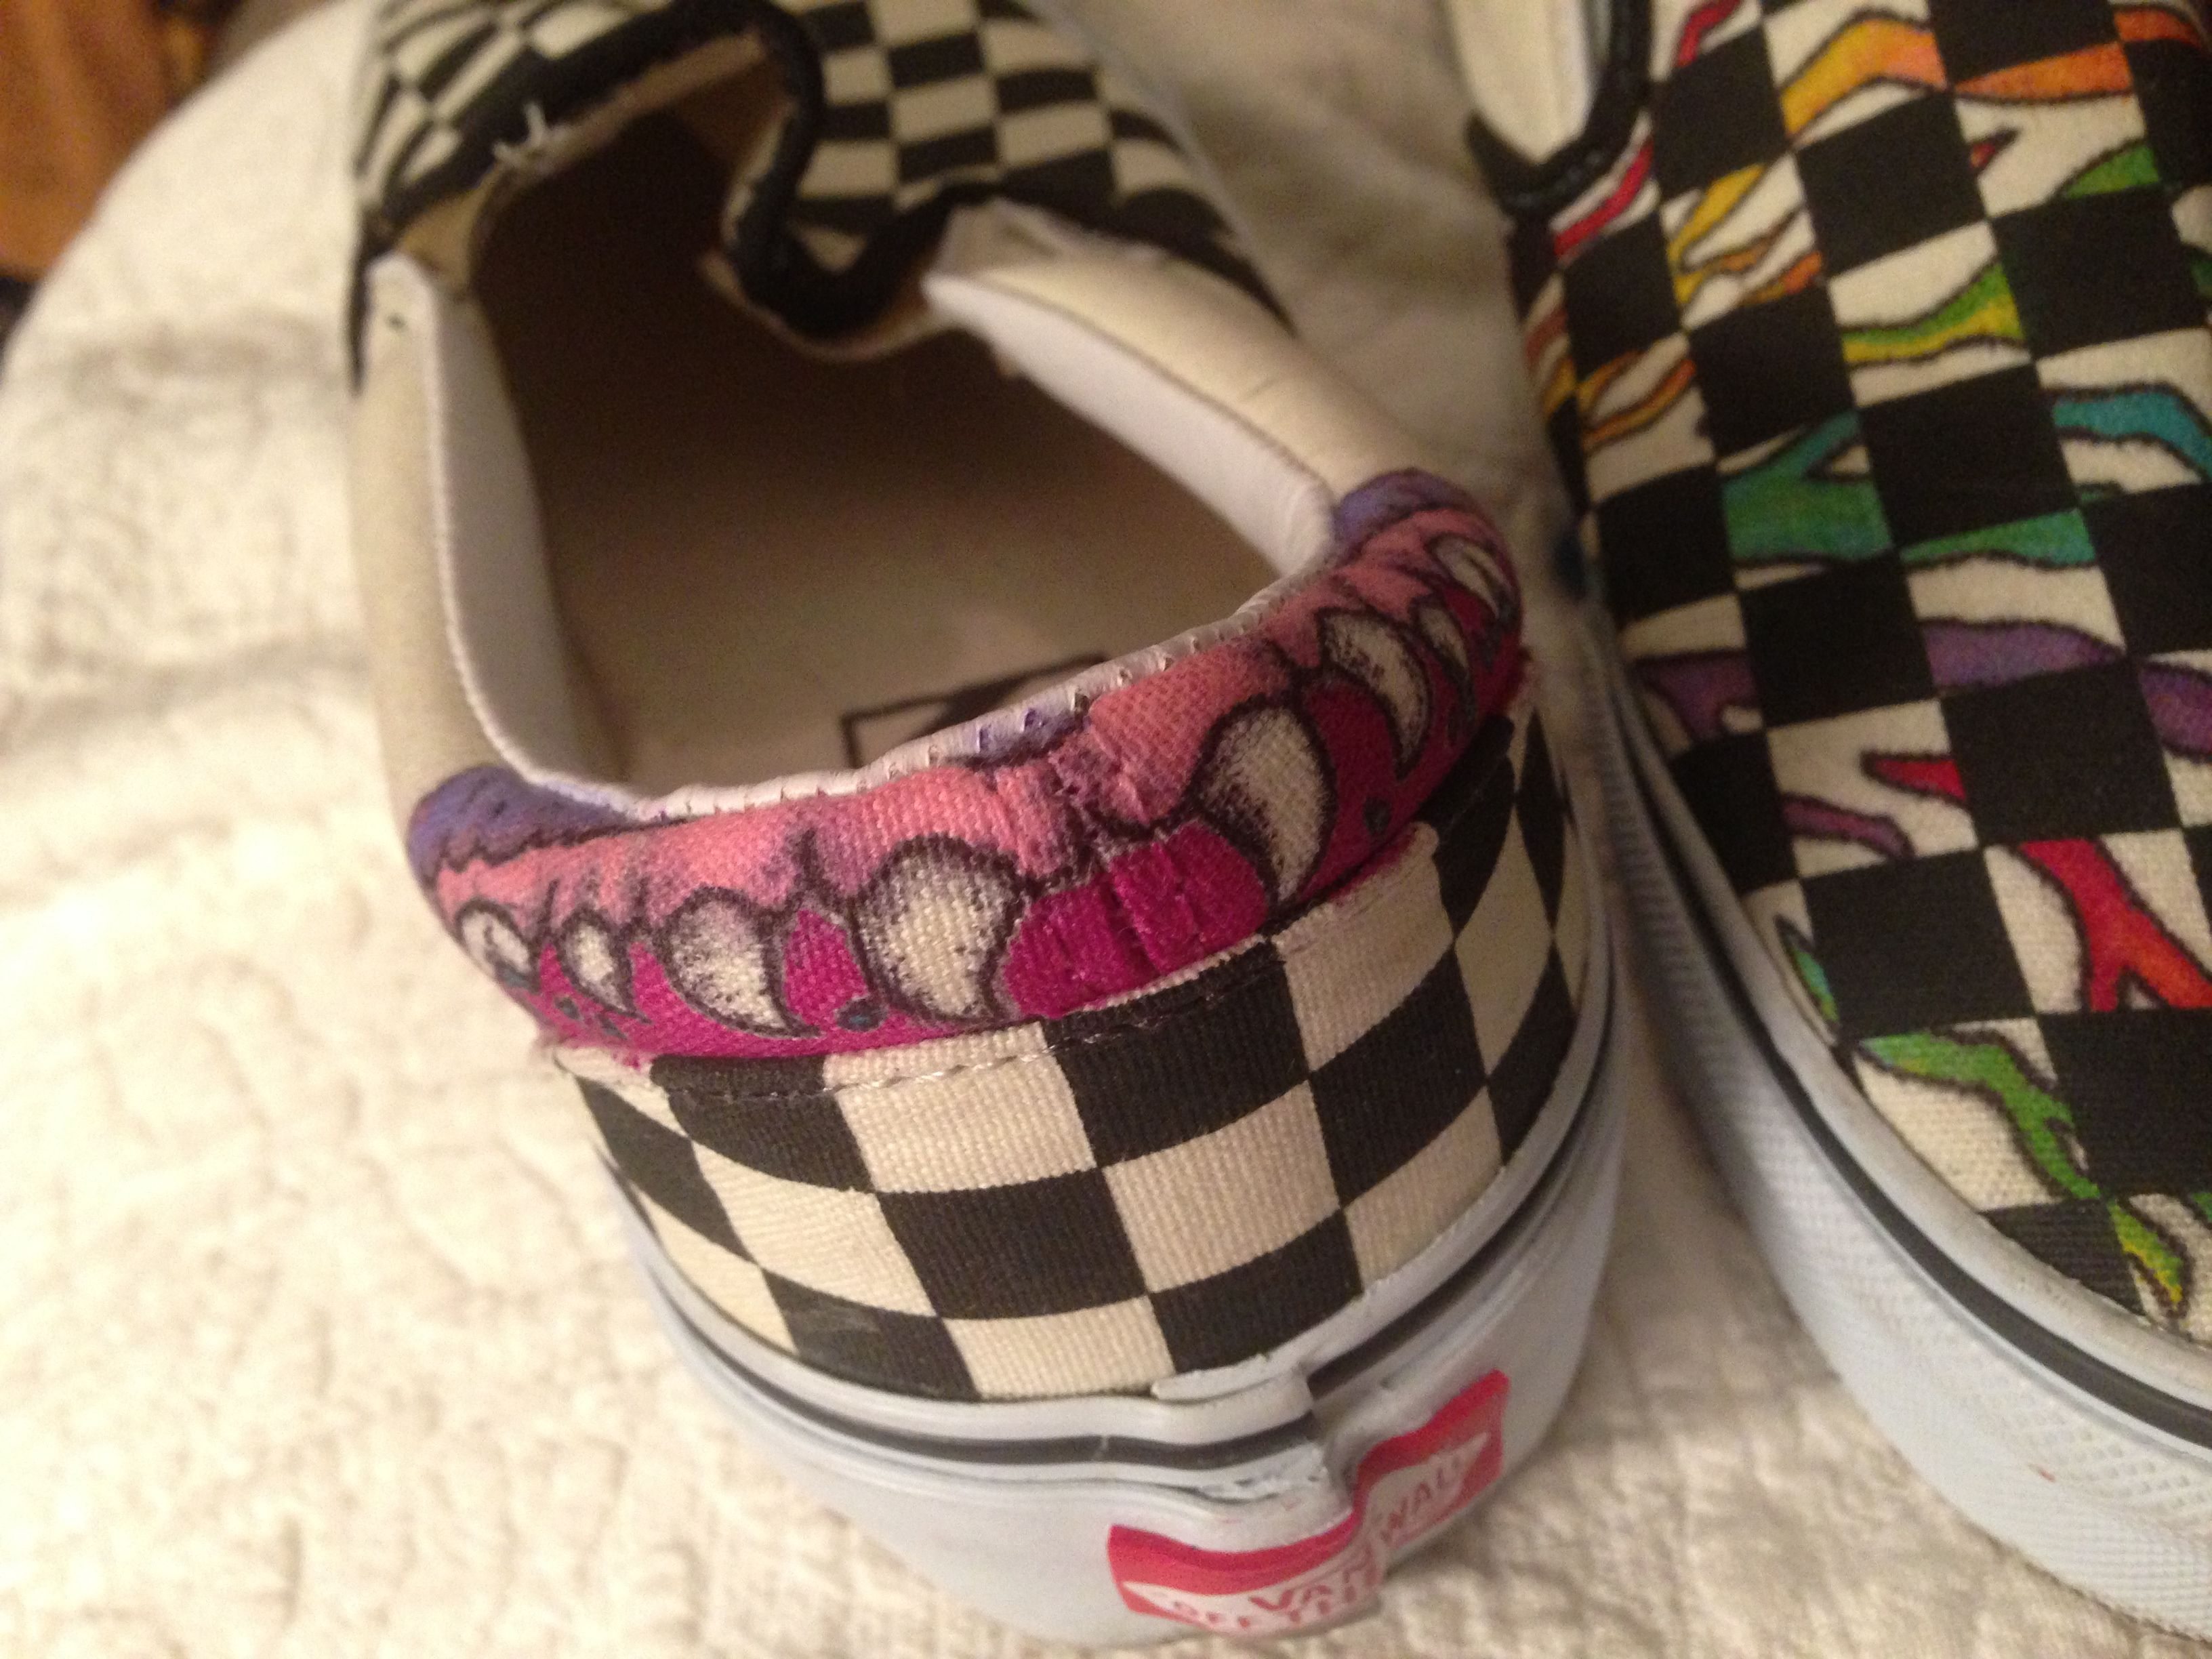 743aeab283ef1e sharpie doodling on black white checkered vans (in-progress)  sharpie  shoes   vans  rainbow  teeth  doodle  zebrastripes  zebra  rainbowzebra   checkeredvans